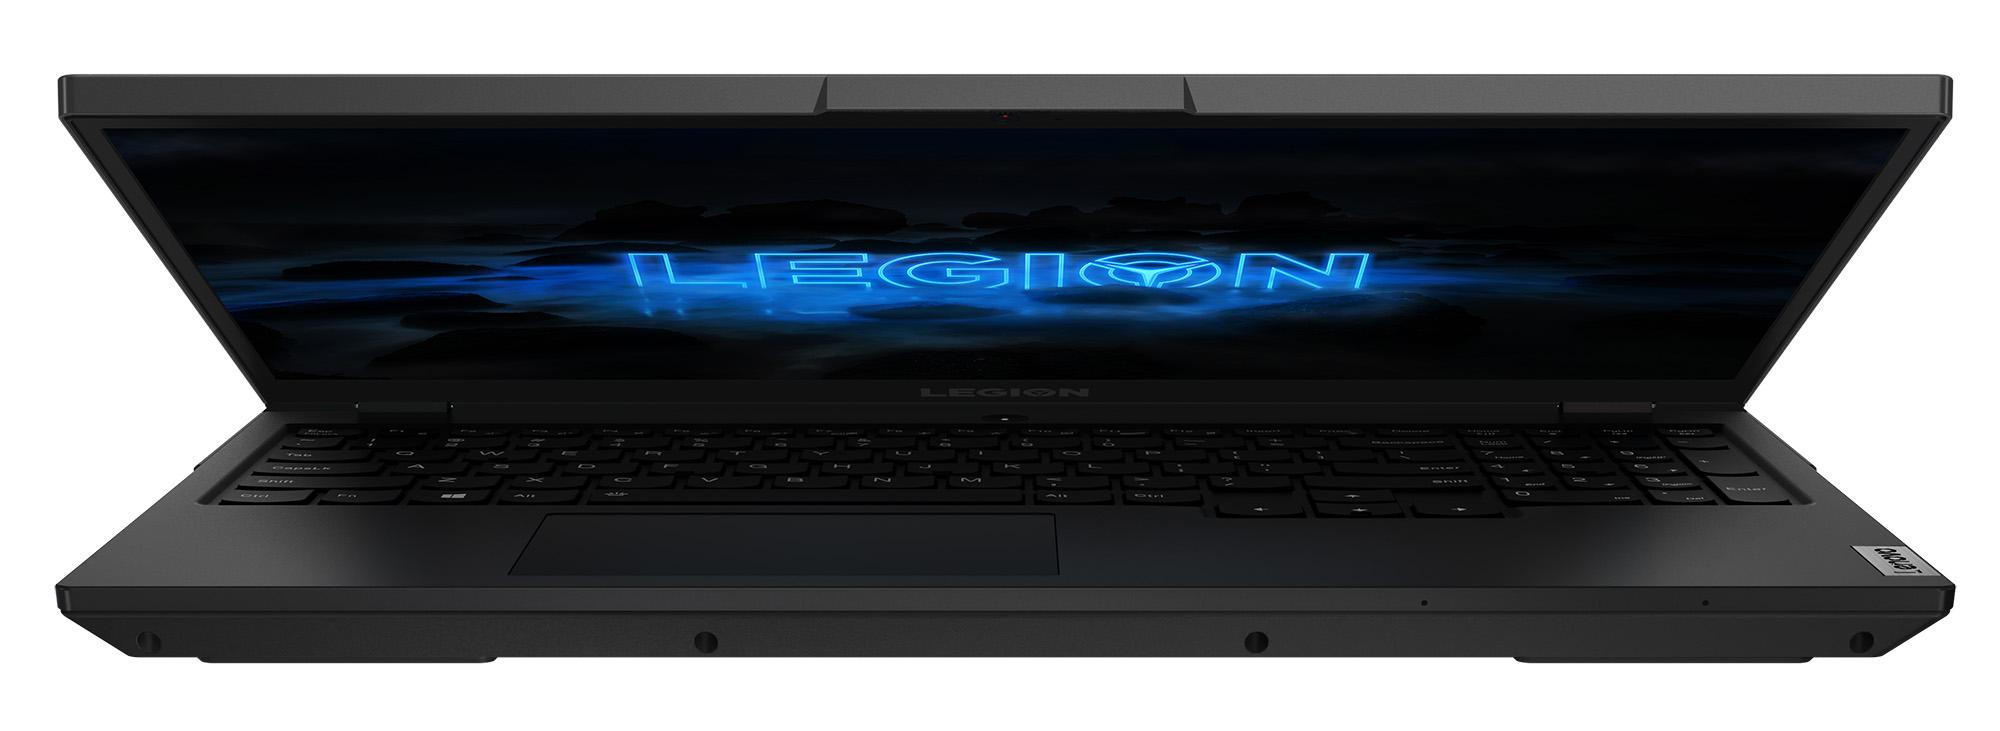 Фото  Ноутбук Lenovo Legion 5i 15IMH05H Phantom Black (82AU00BDRE)